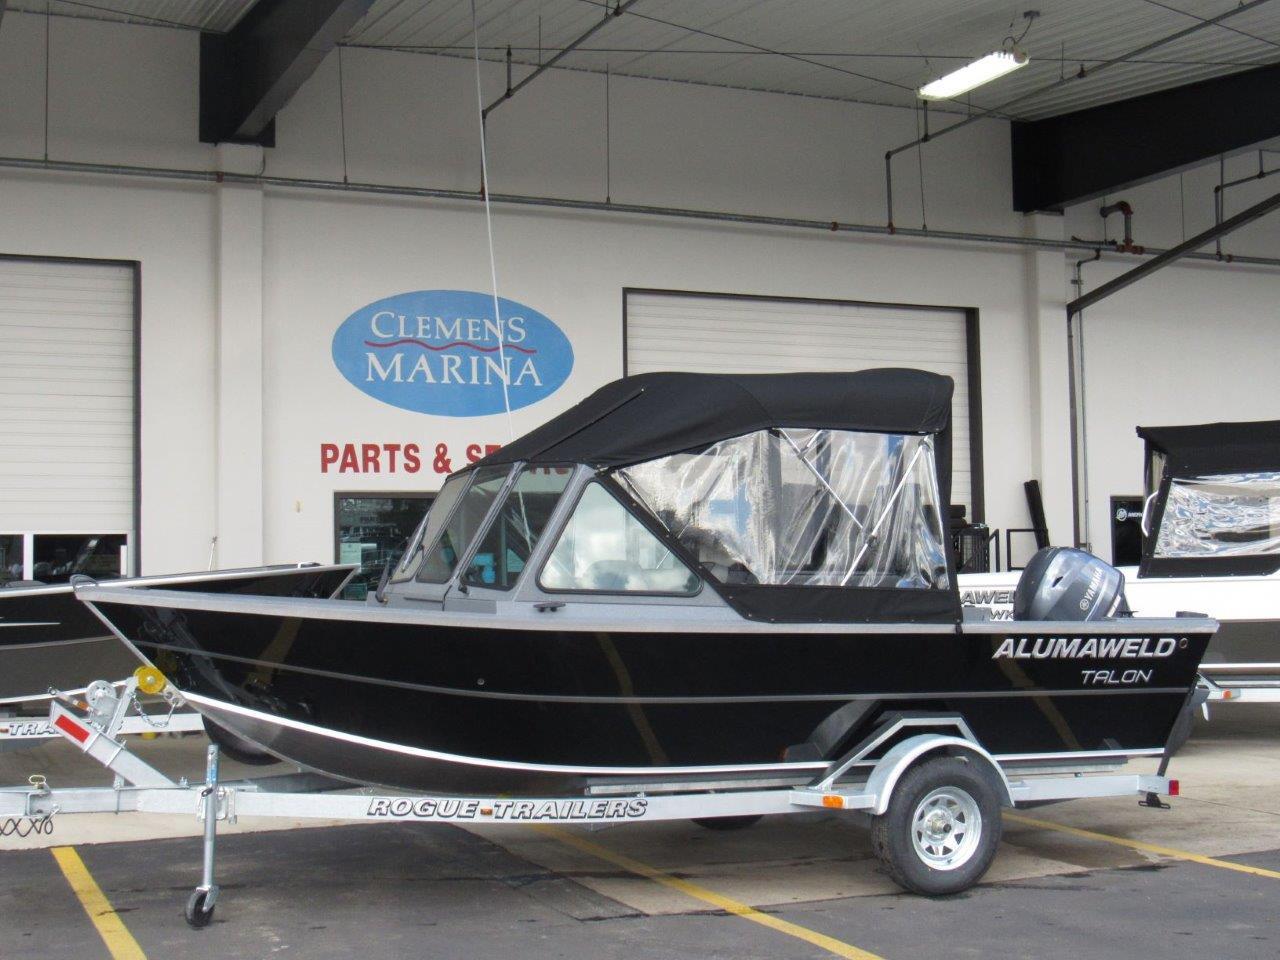 Alumaweld boats for sale in Oregon - Boat Trader